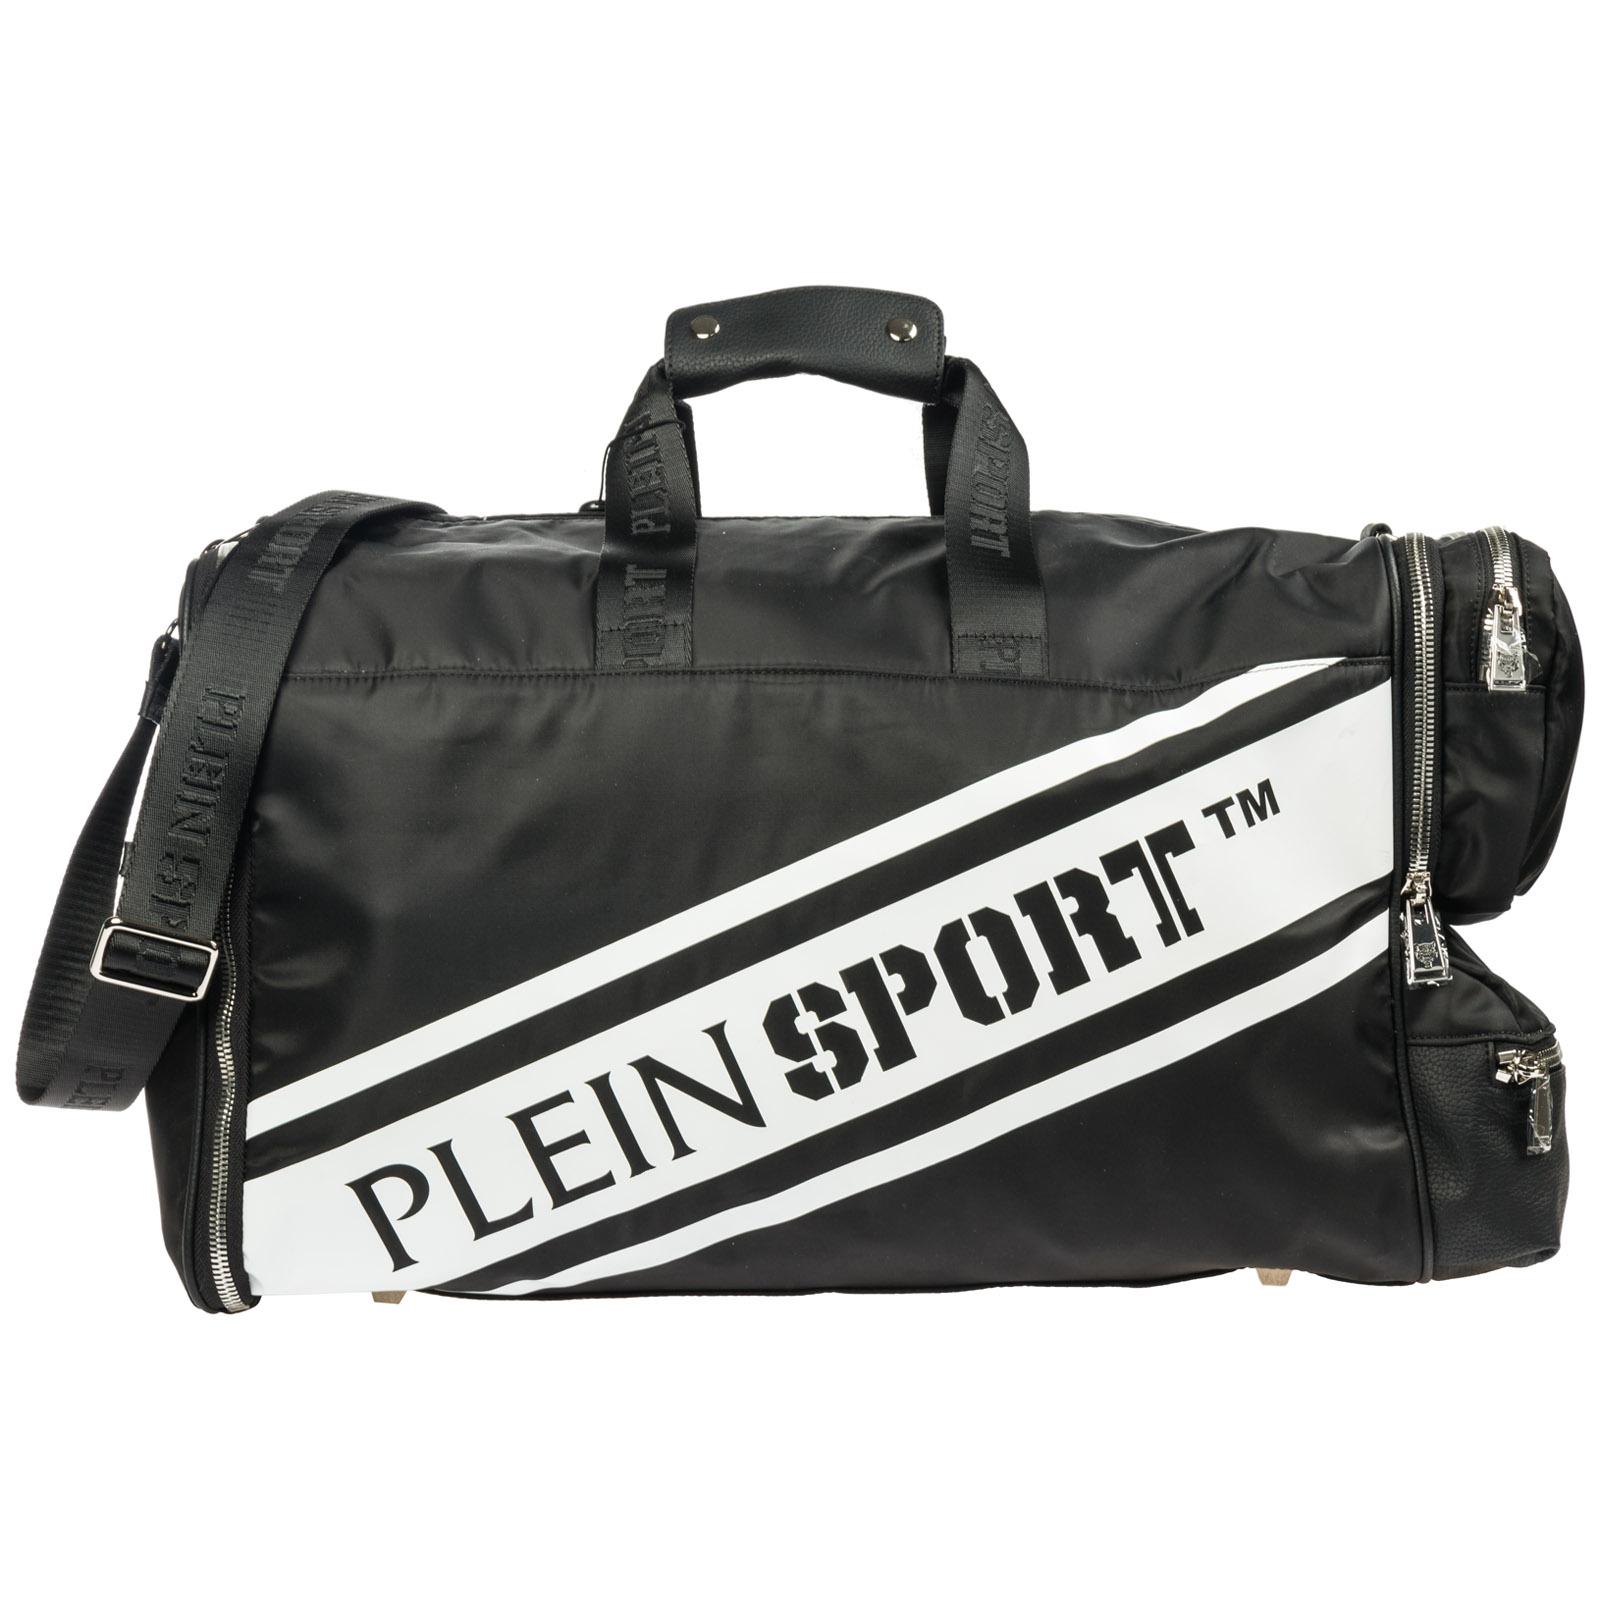 Duffle bag Plein Sport S19A MBD 0121 STE003N black - white  5cb73c5eb1792